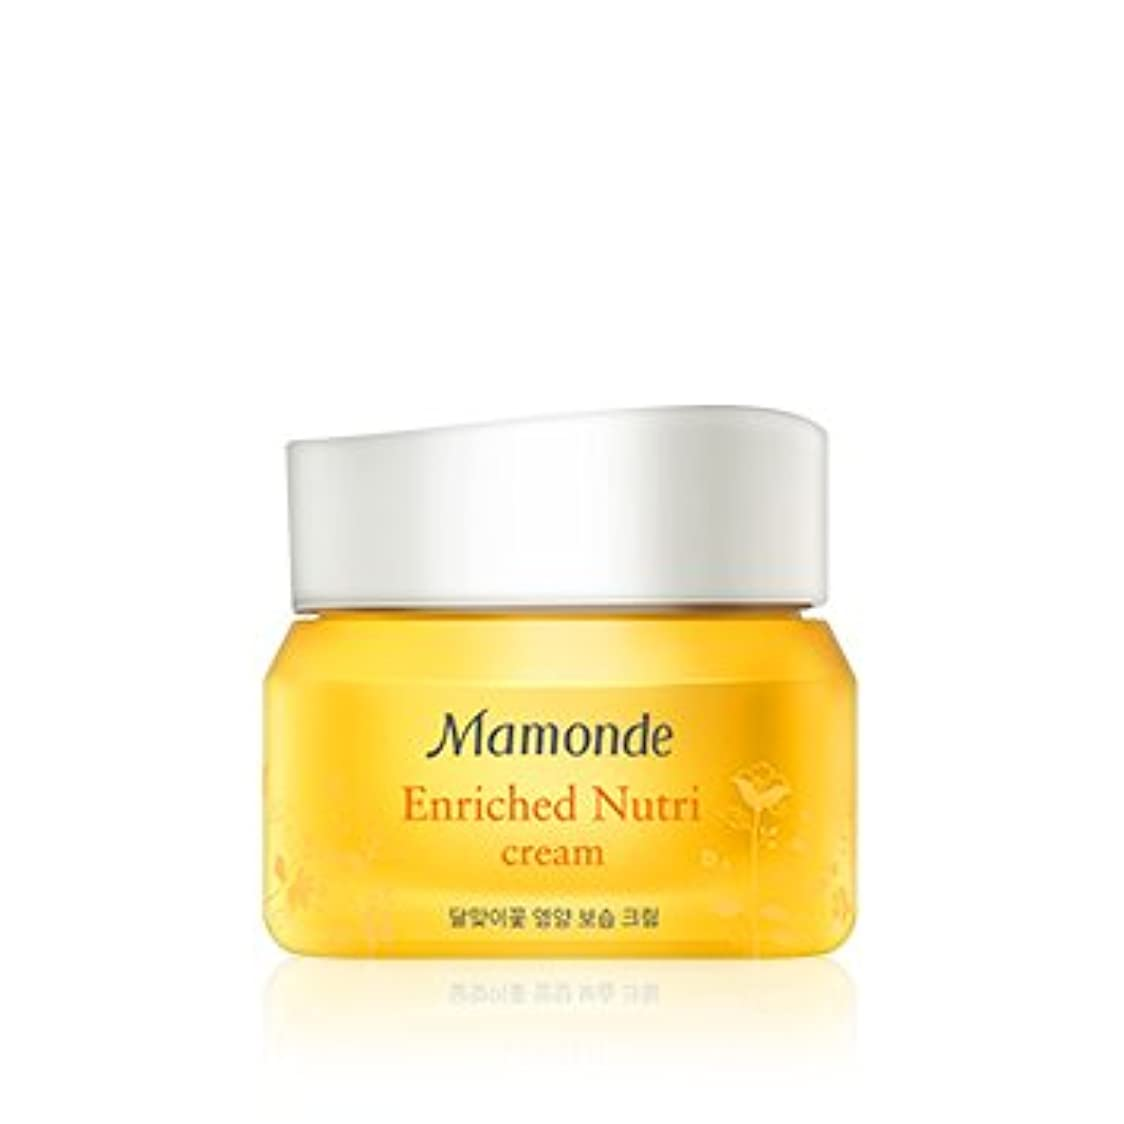 [New] Mamonde Enriched Nutri Cream 50ml/マモンド エンリッチド ニュートリ クリーム 50ml [並行輸入品]